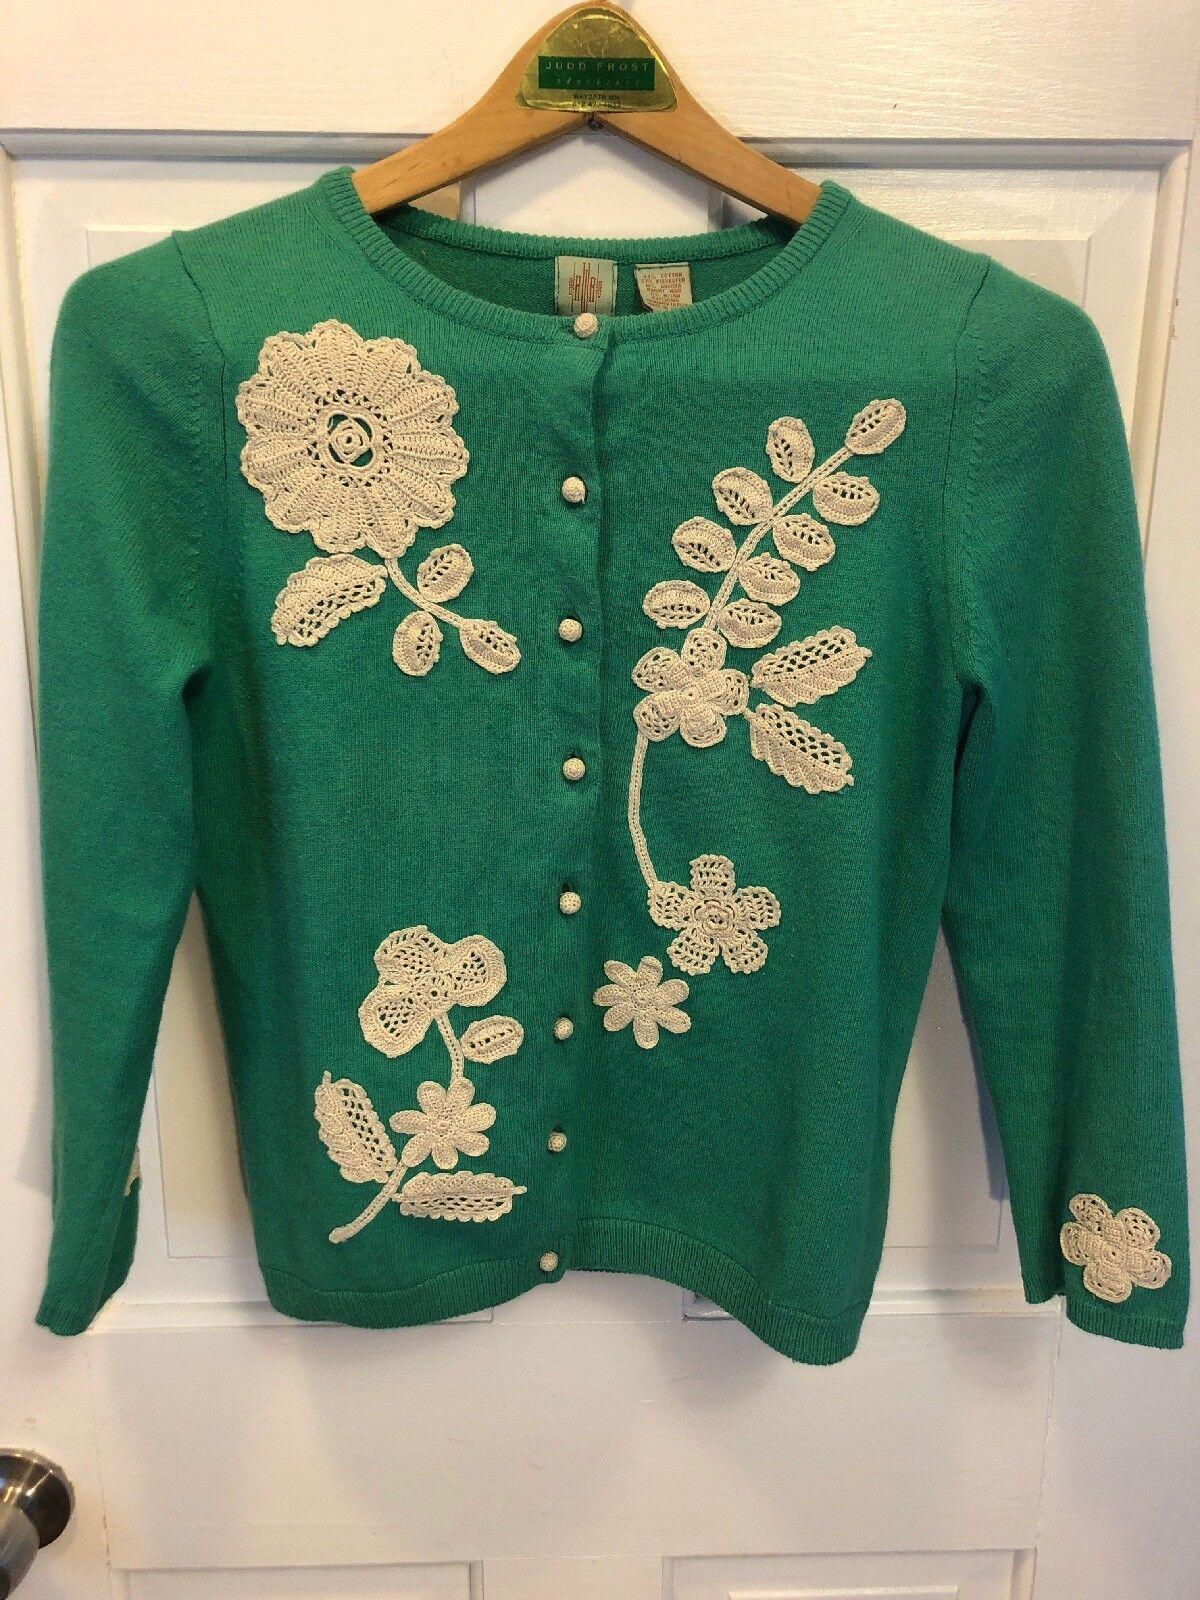 189. Rare Anthropologie HWR Monogram Vintage Style Applique autodigan Sweater S